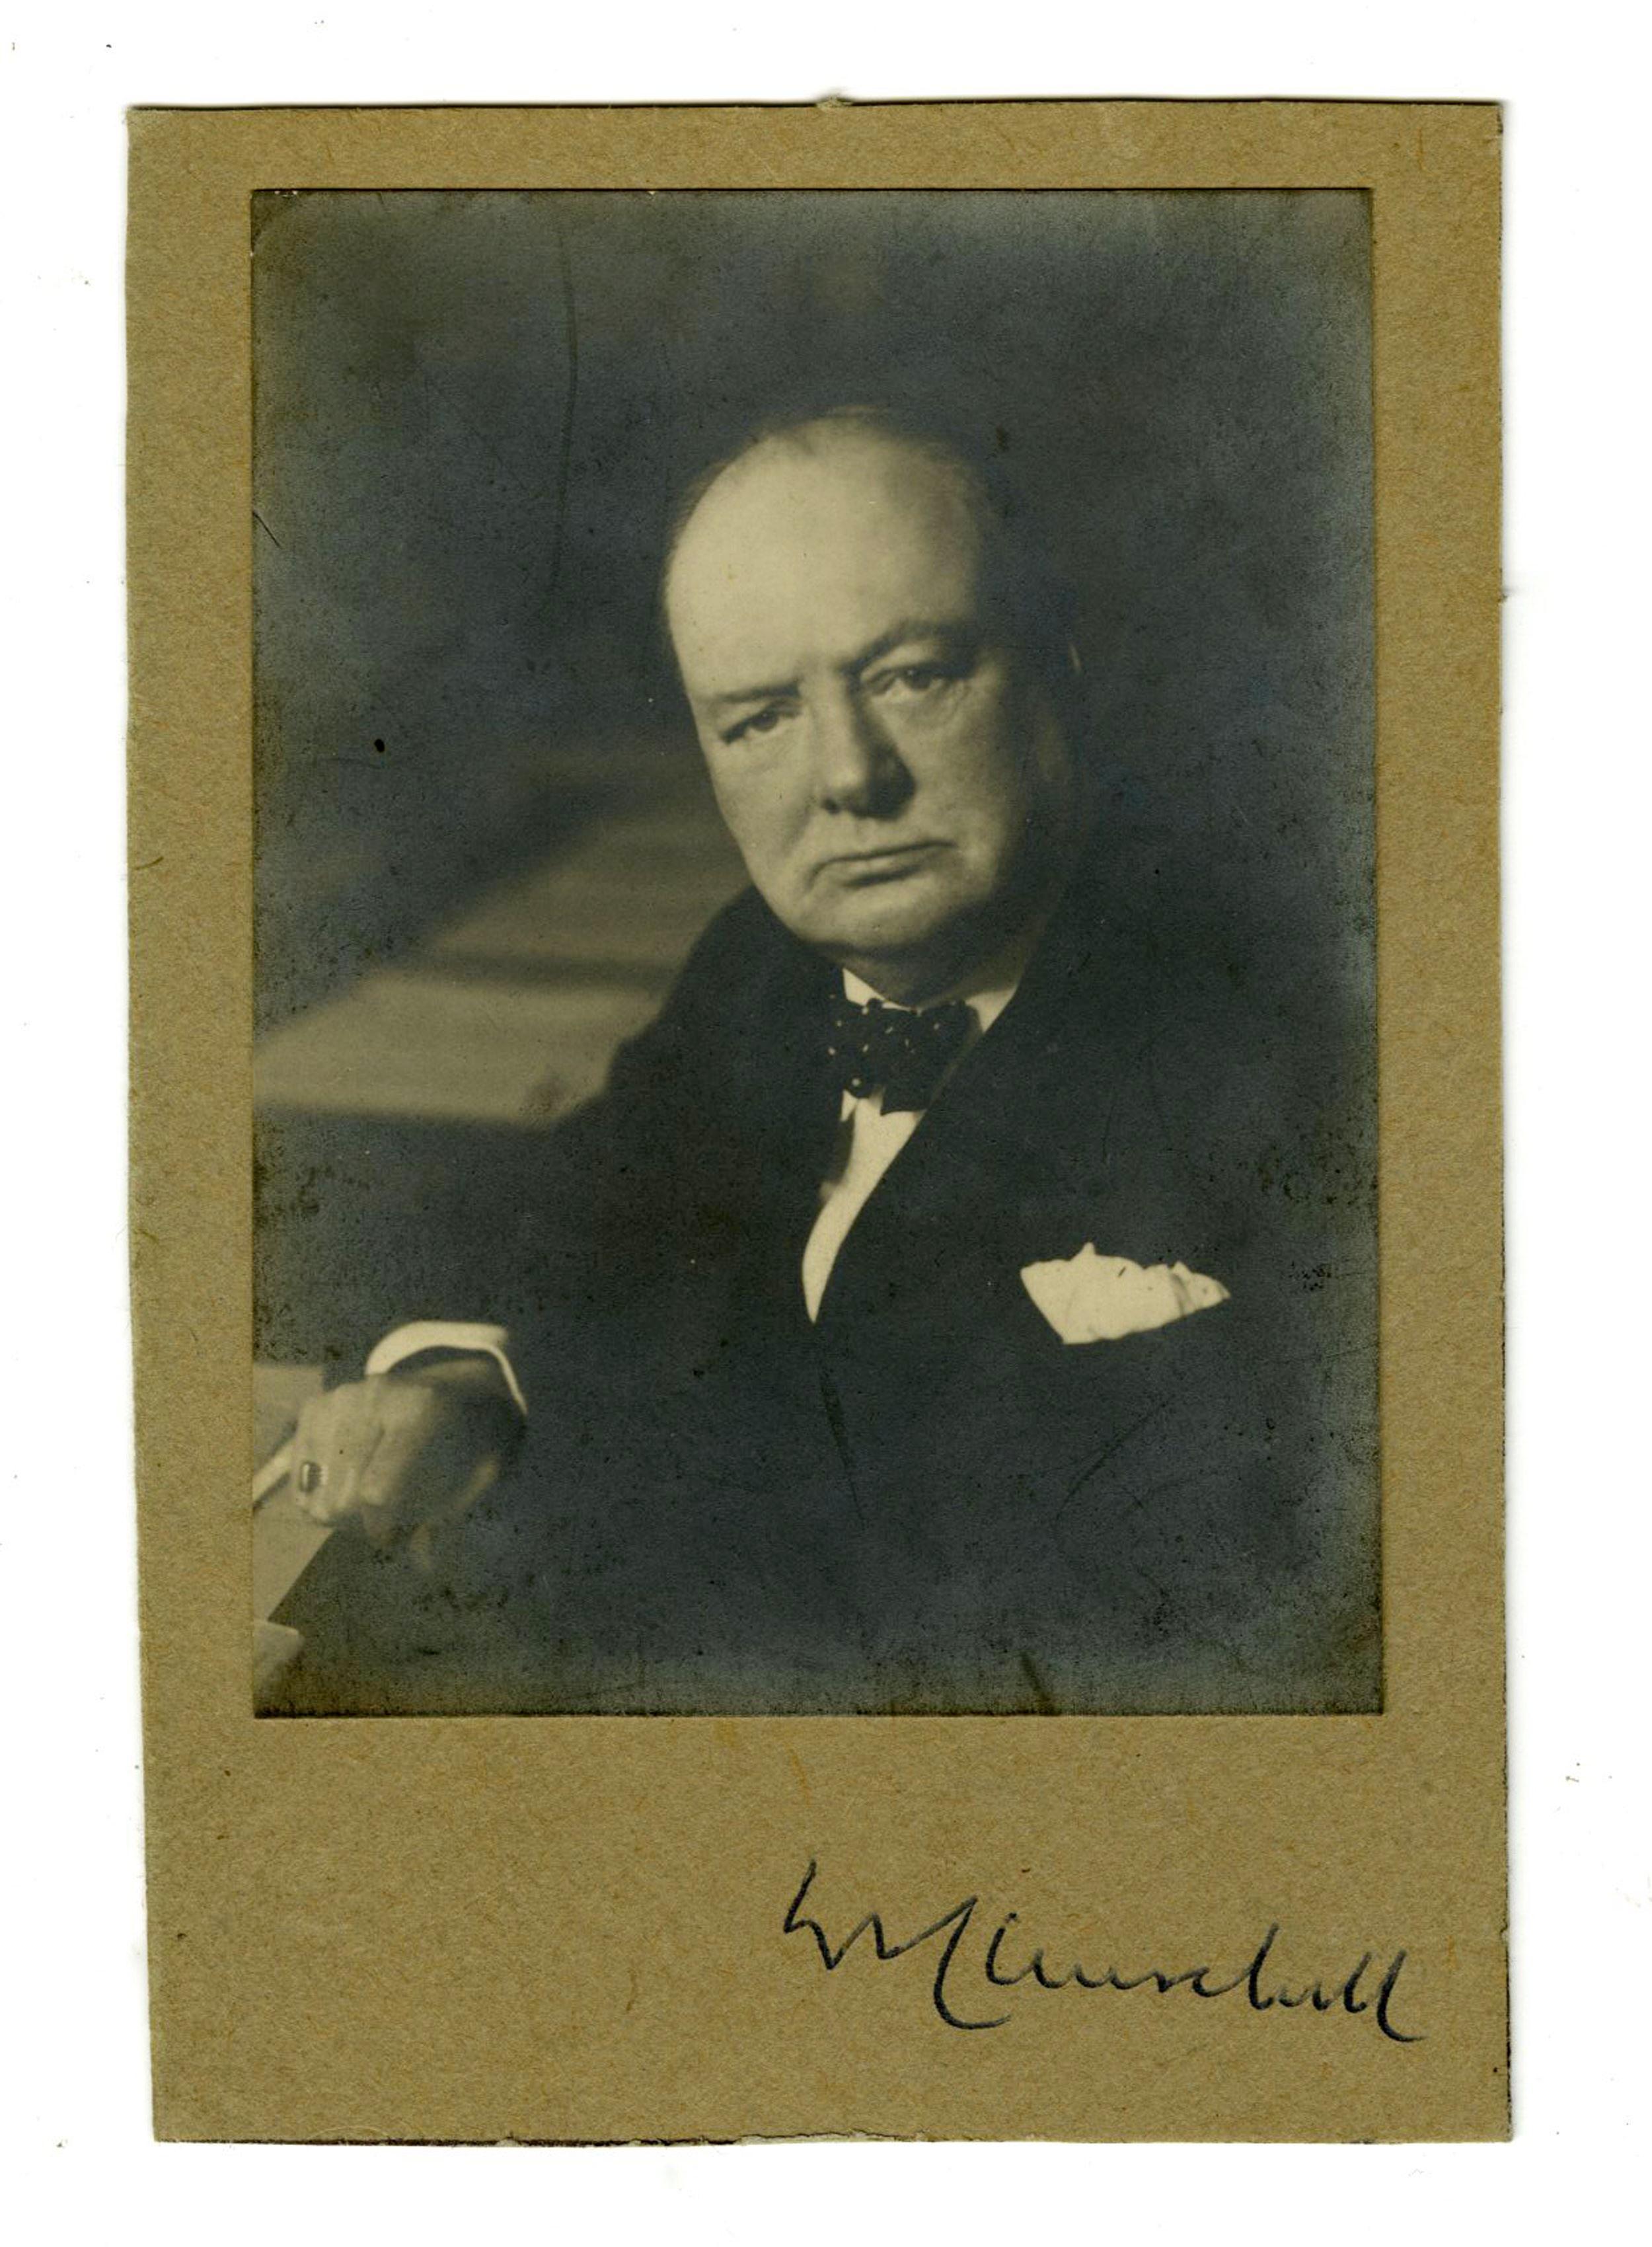 Stoic Winston Churchill Signed Silver Gelatin Print Portrait